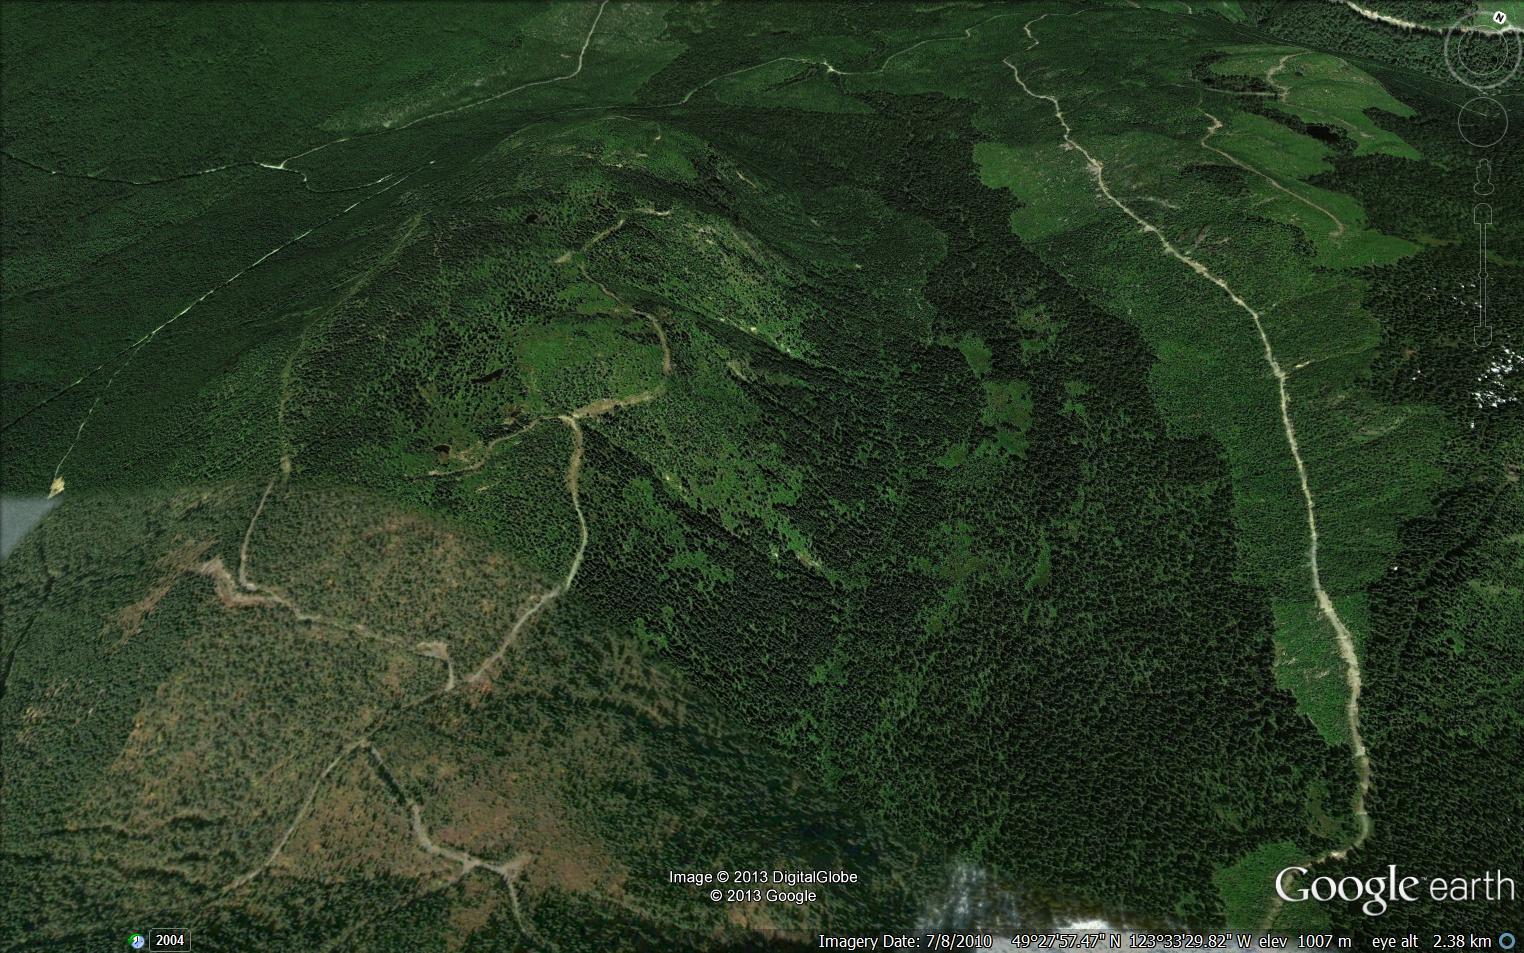 Google Earth - Maps - Dakota Bowl Watershed - Elphinstone ... on google maps street view world, google maps street view location, google maps france, google maps update 2013, google maps 2014,